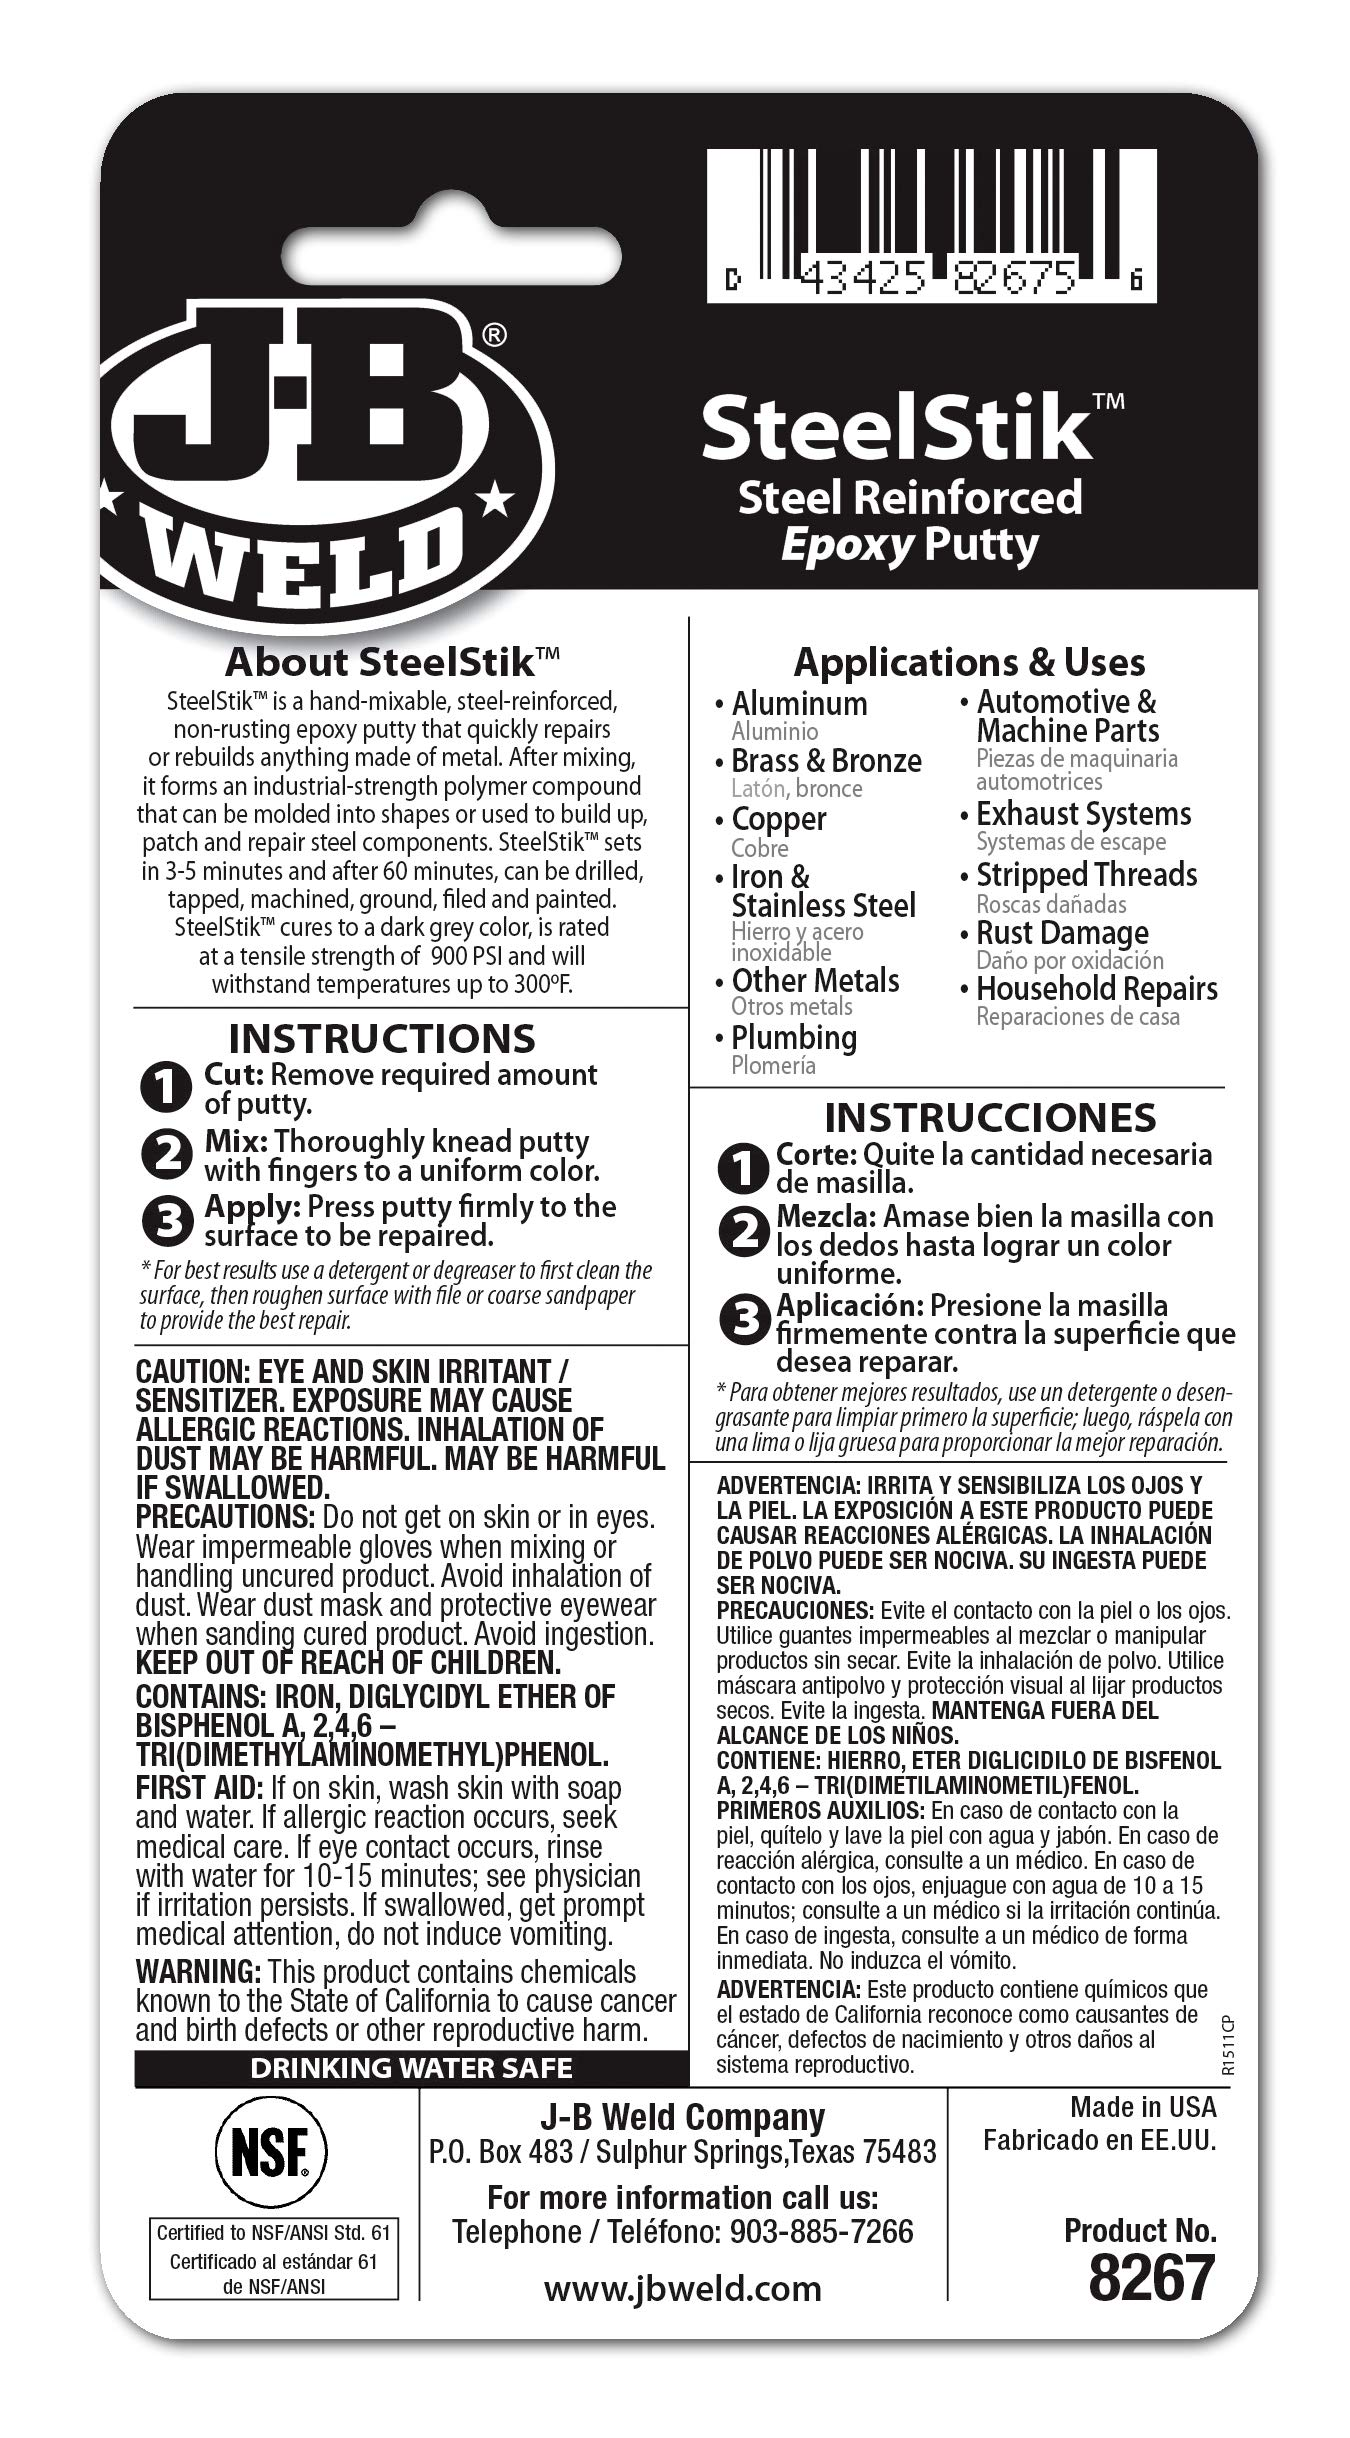 J-B Weld 8267-S SteelStik Steel Reinforced Epoxy Putty Stick - 2 oz